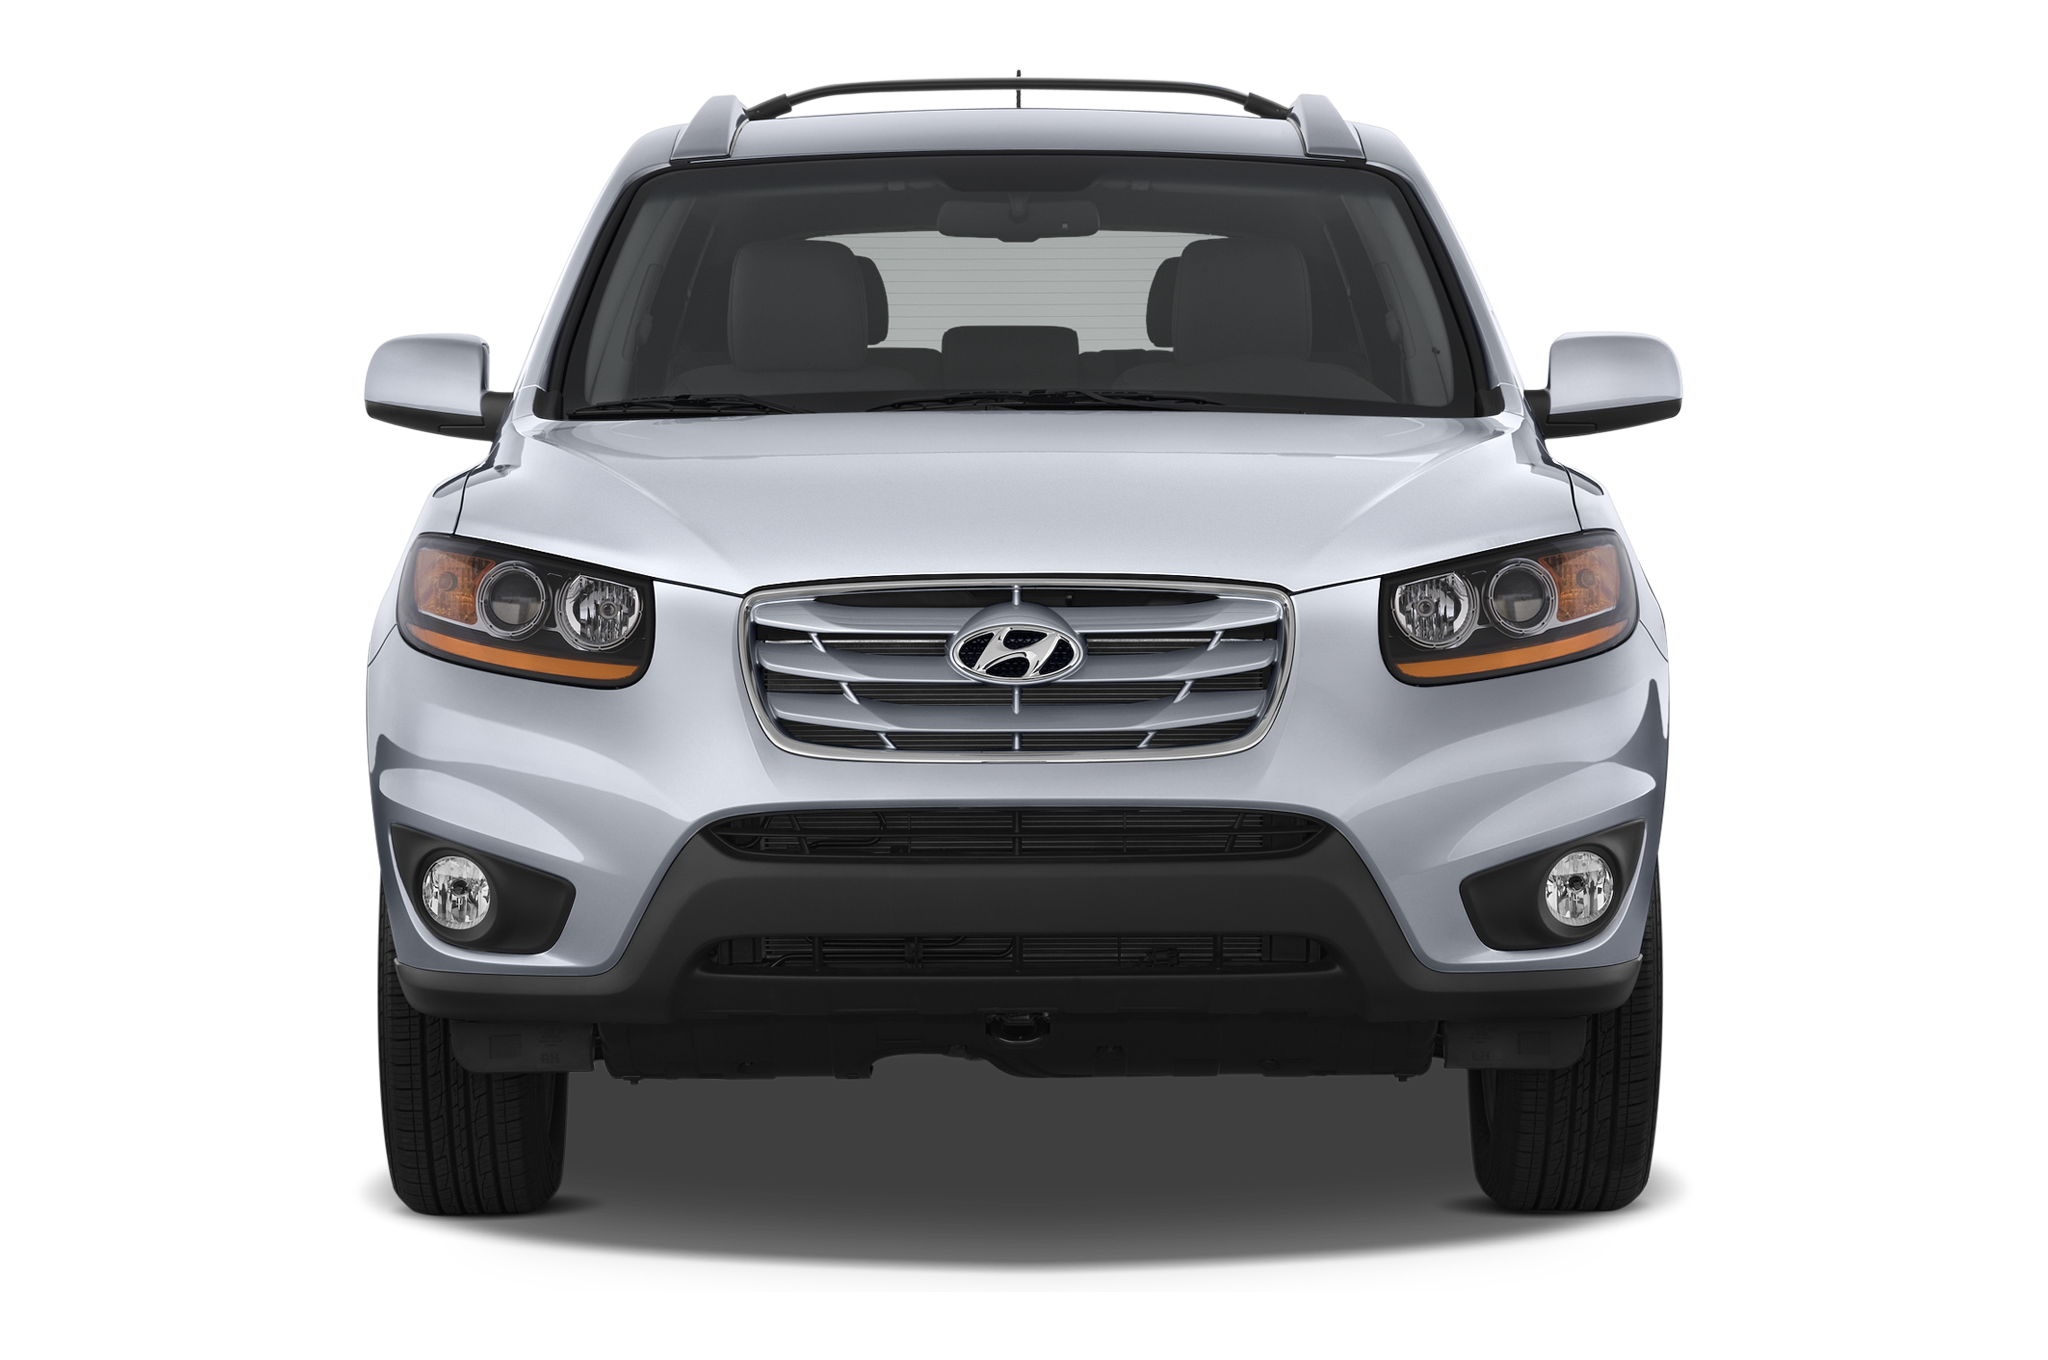 Hyundai Santa Fe I 2000 - 2012 SUV 5 door #4